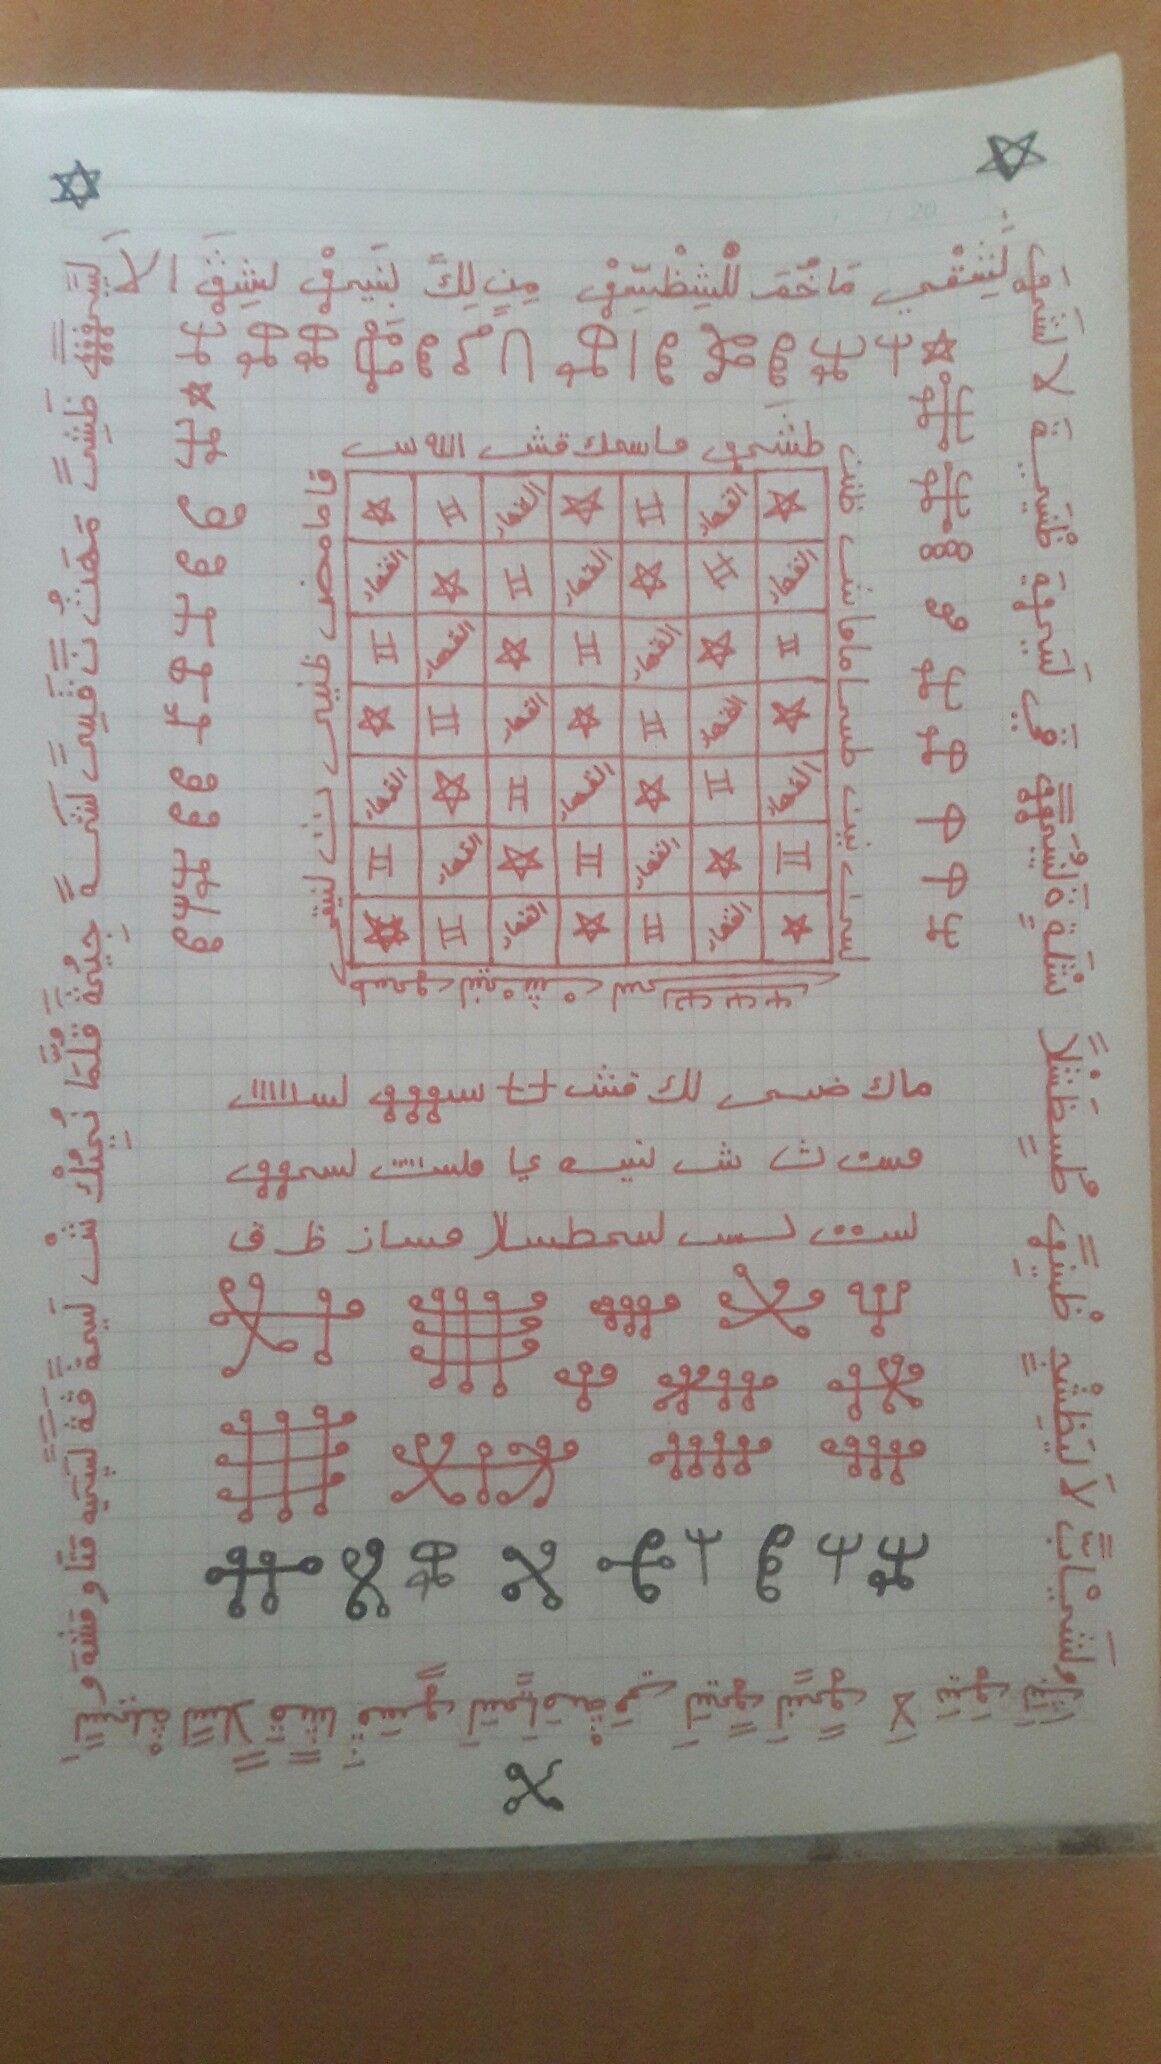 Kahhar Tilsimlari Sifa Duasi Dualar Kitap Rafi